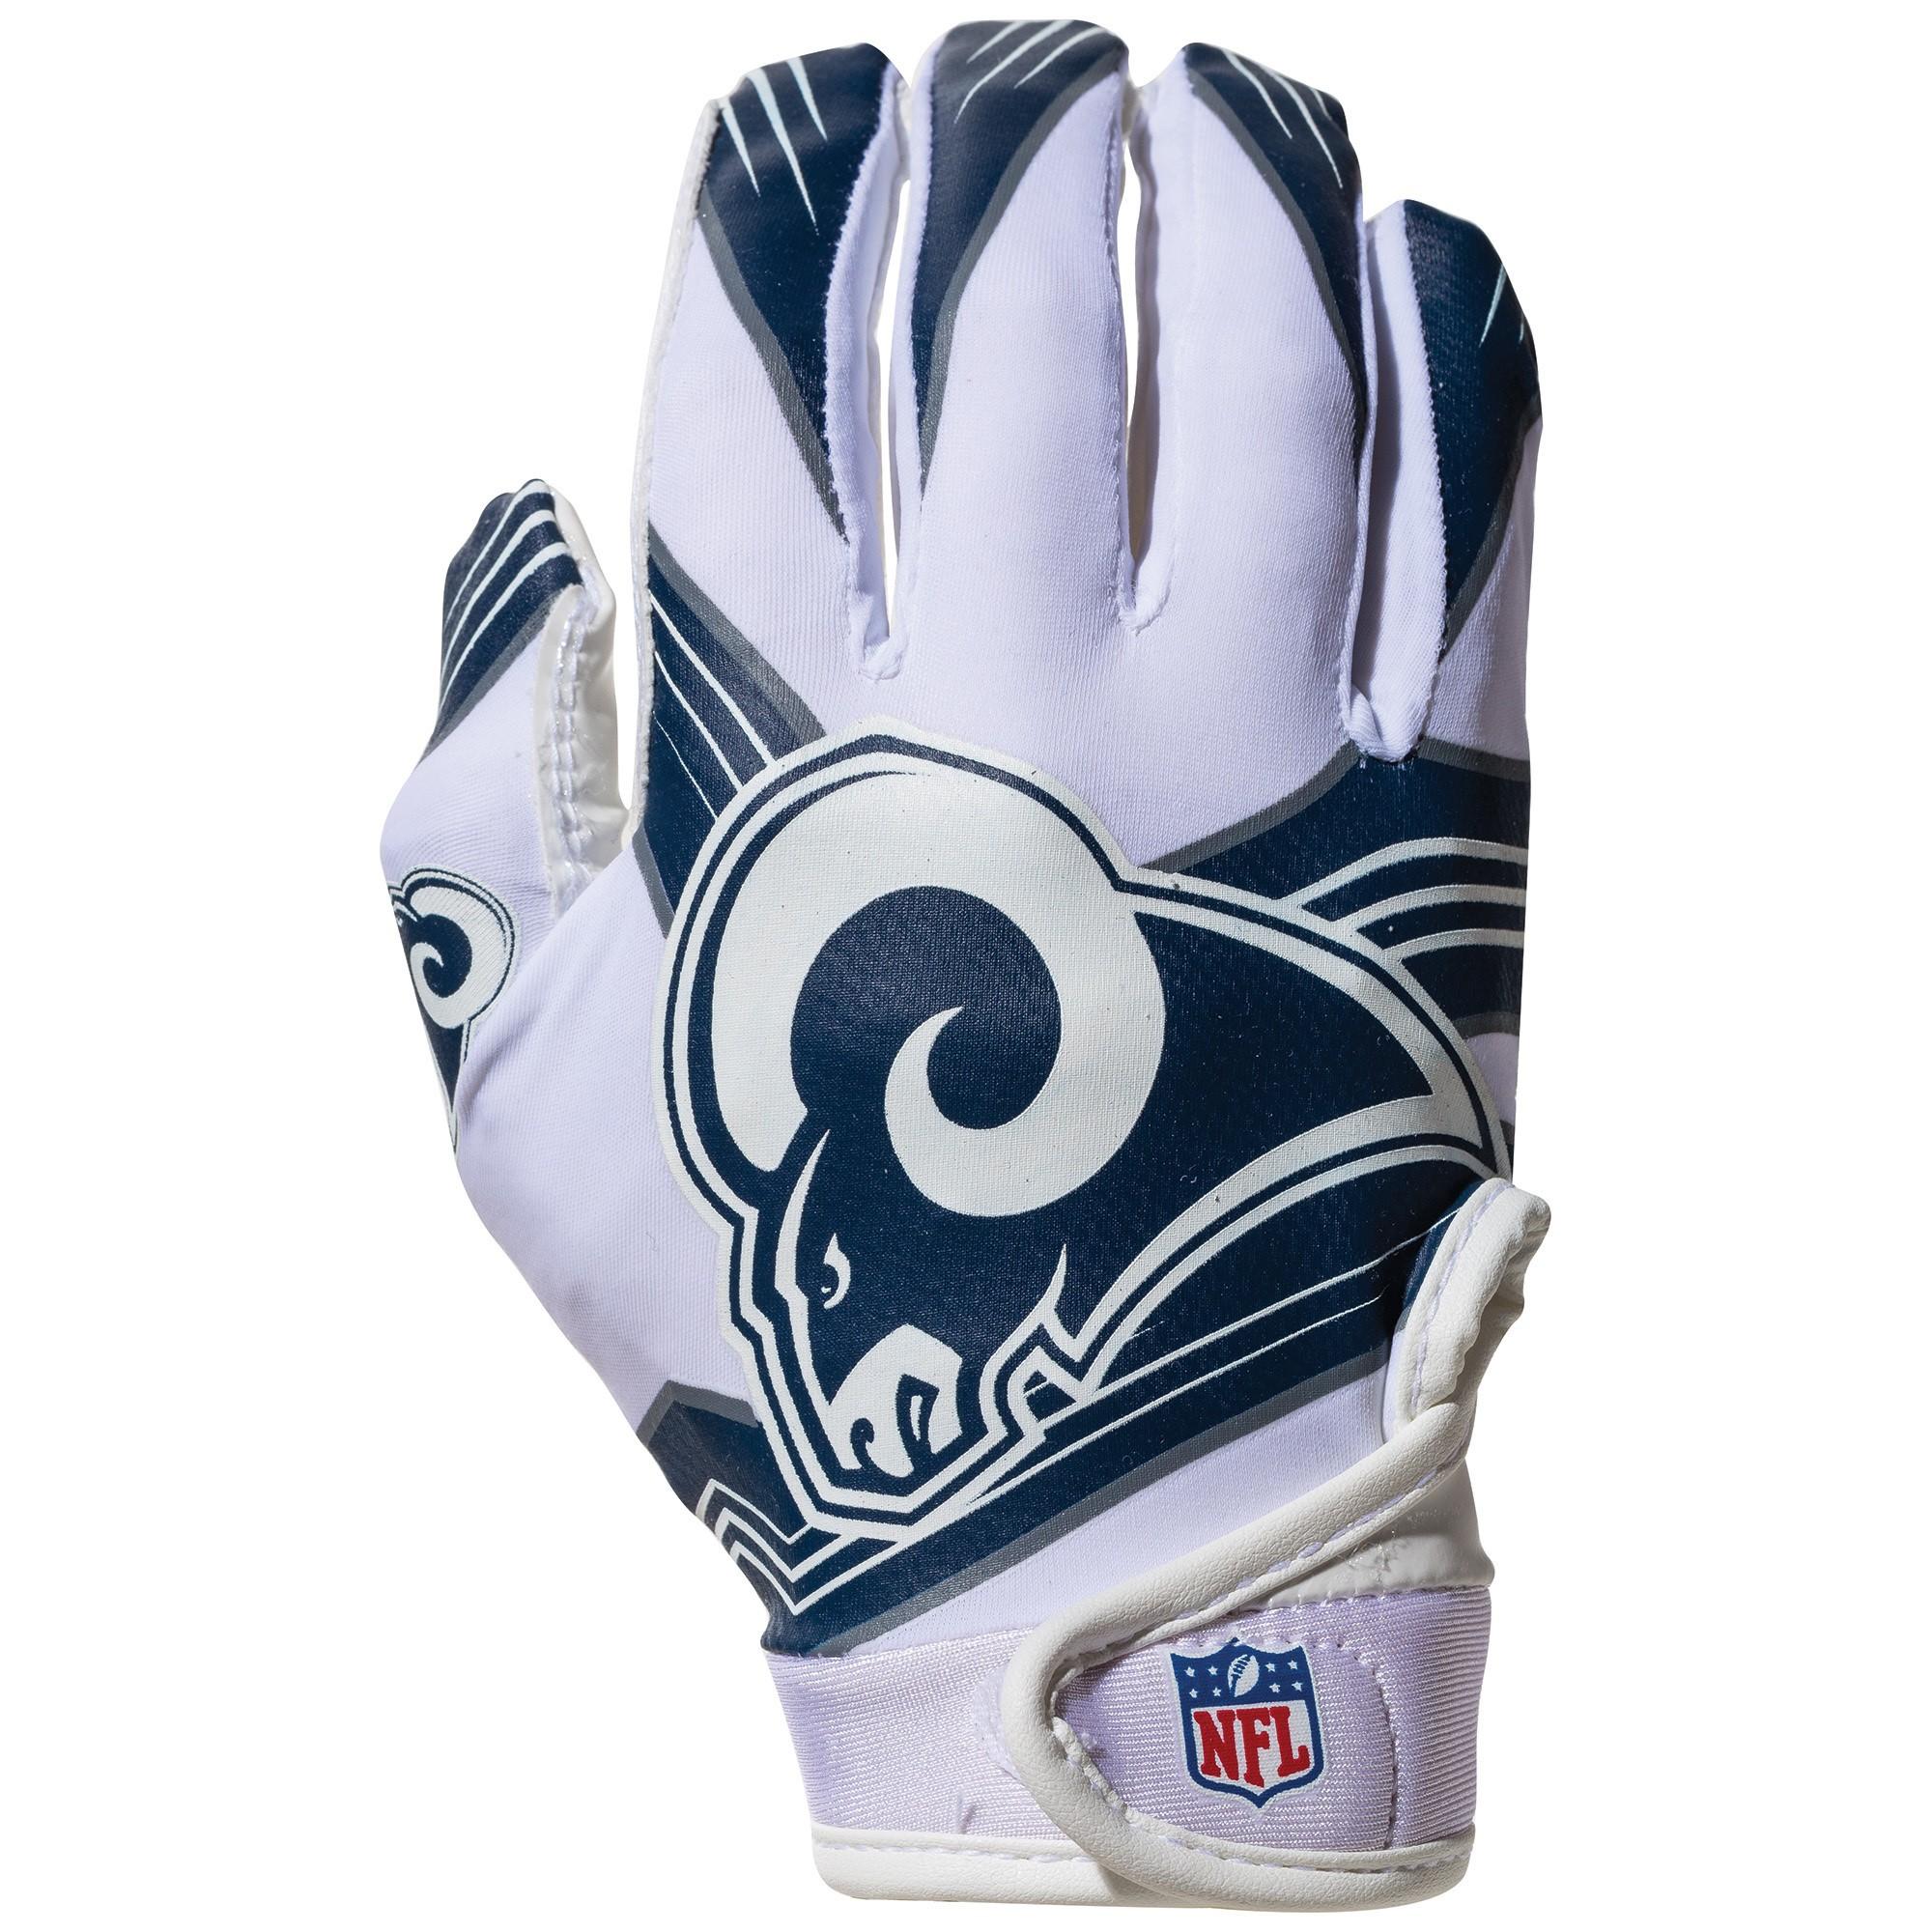 Nfl Los Angeles Rams Franklin Receiver Gloves Football Gloves Nfl Nfl Los Angeles